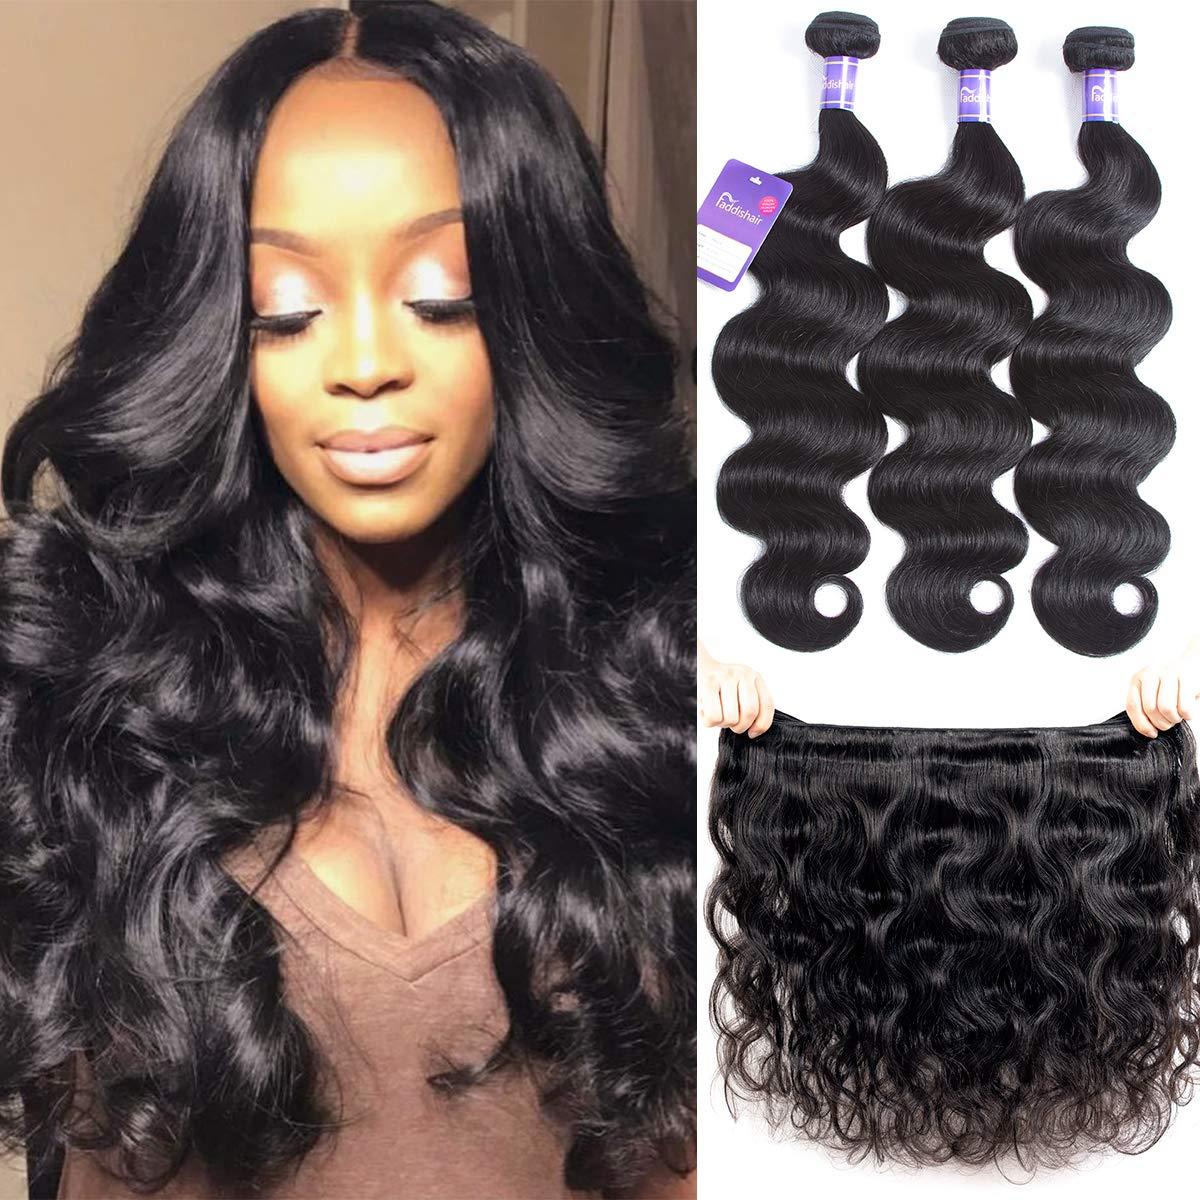 "Amazon.com : Faddishair Brazilian Bundles Virgin Human Hair 14""16""18"" Body  Wave 3 Bundles 100% Unprocessed Virgin Human Hair Weave Brazilian Hair  Bundles : Beauty"